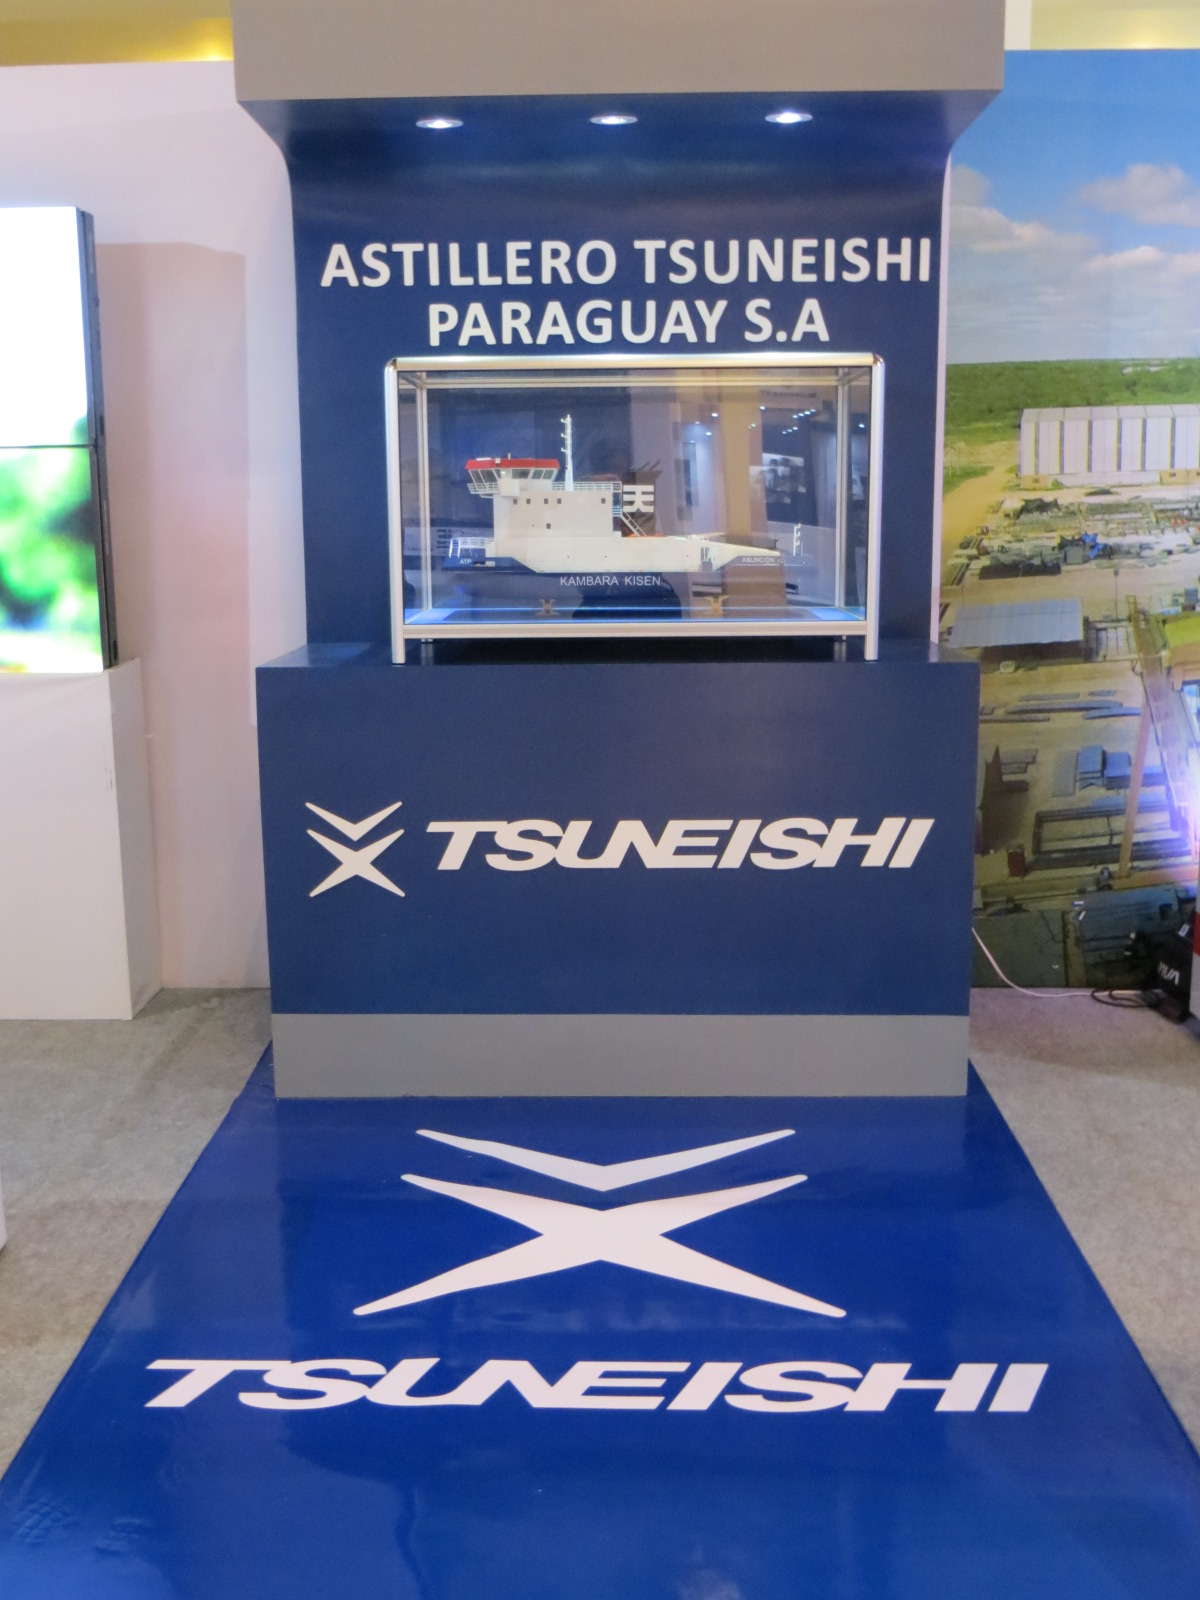 ASTILLERO TSUNEISHI PARAGUAYブース